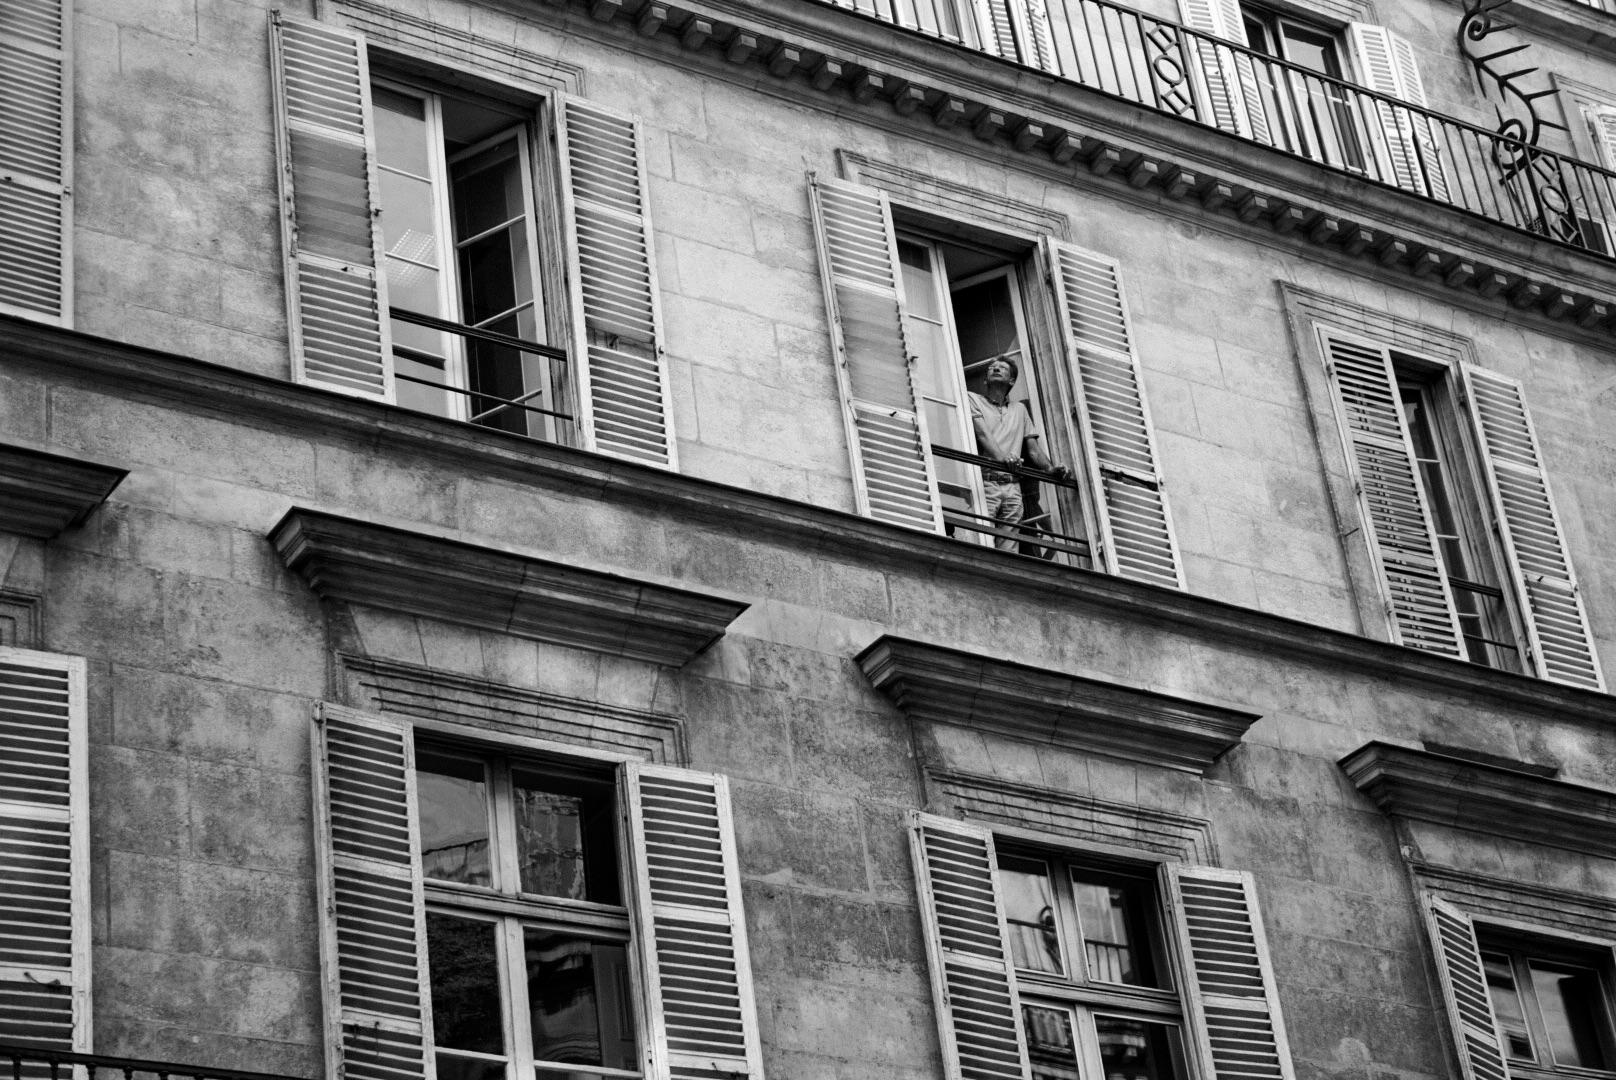 Man looking out window .jpg